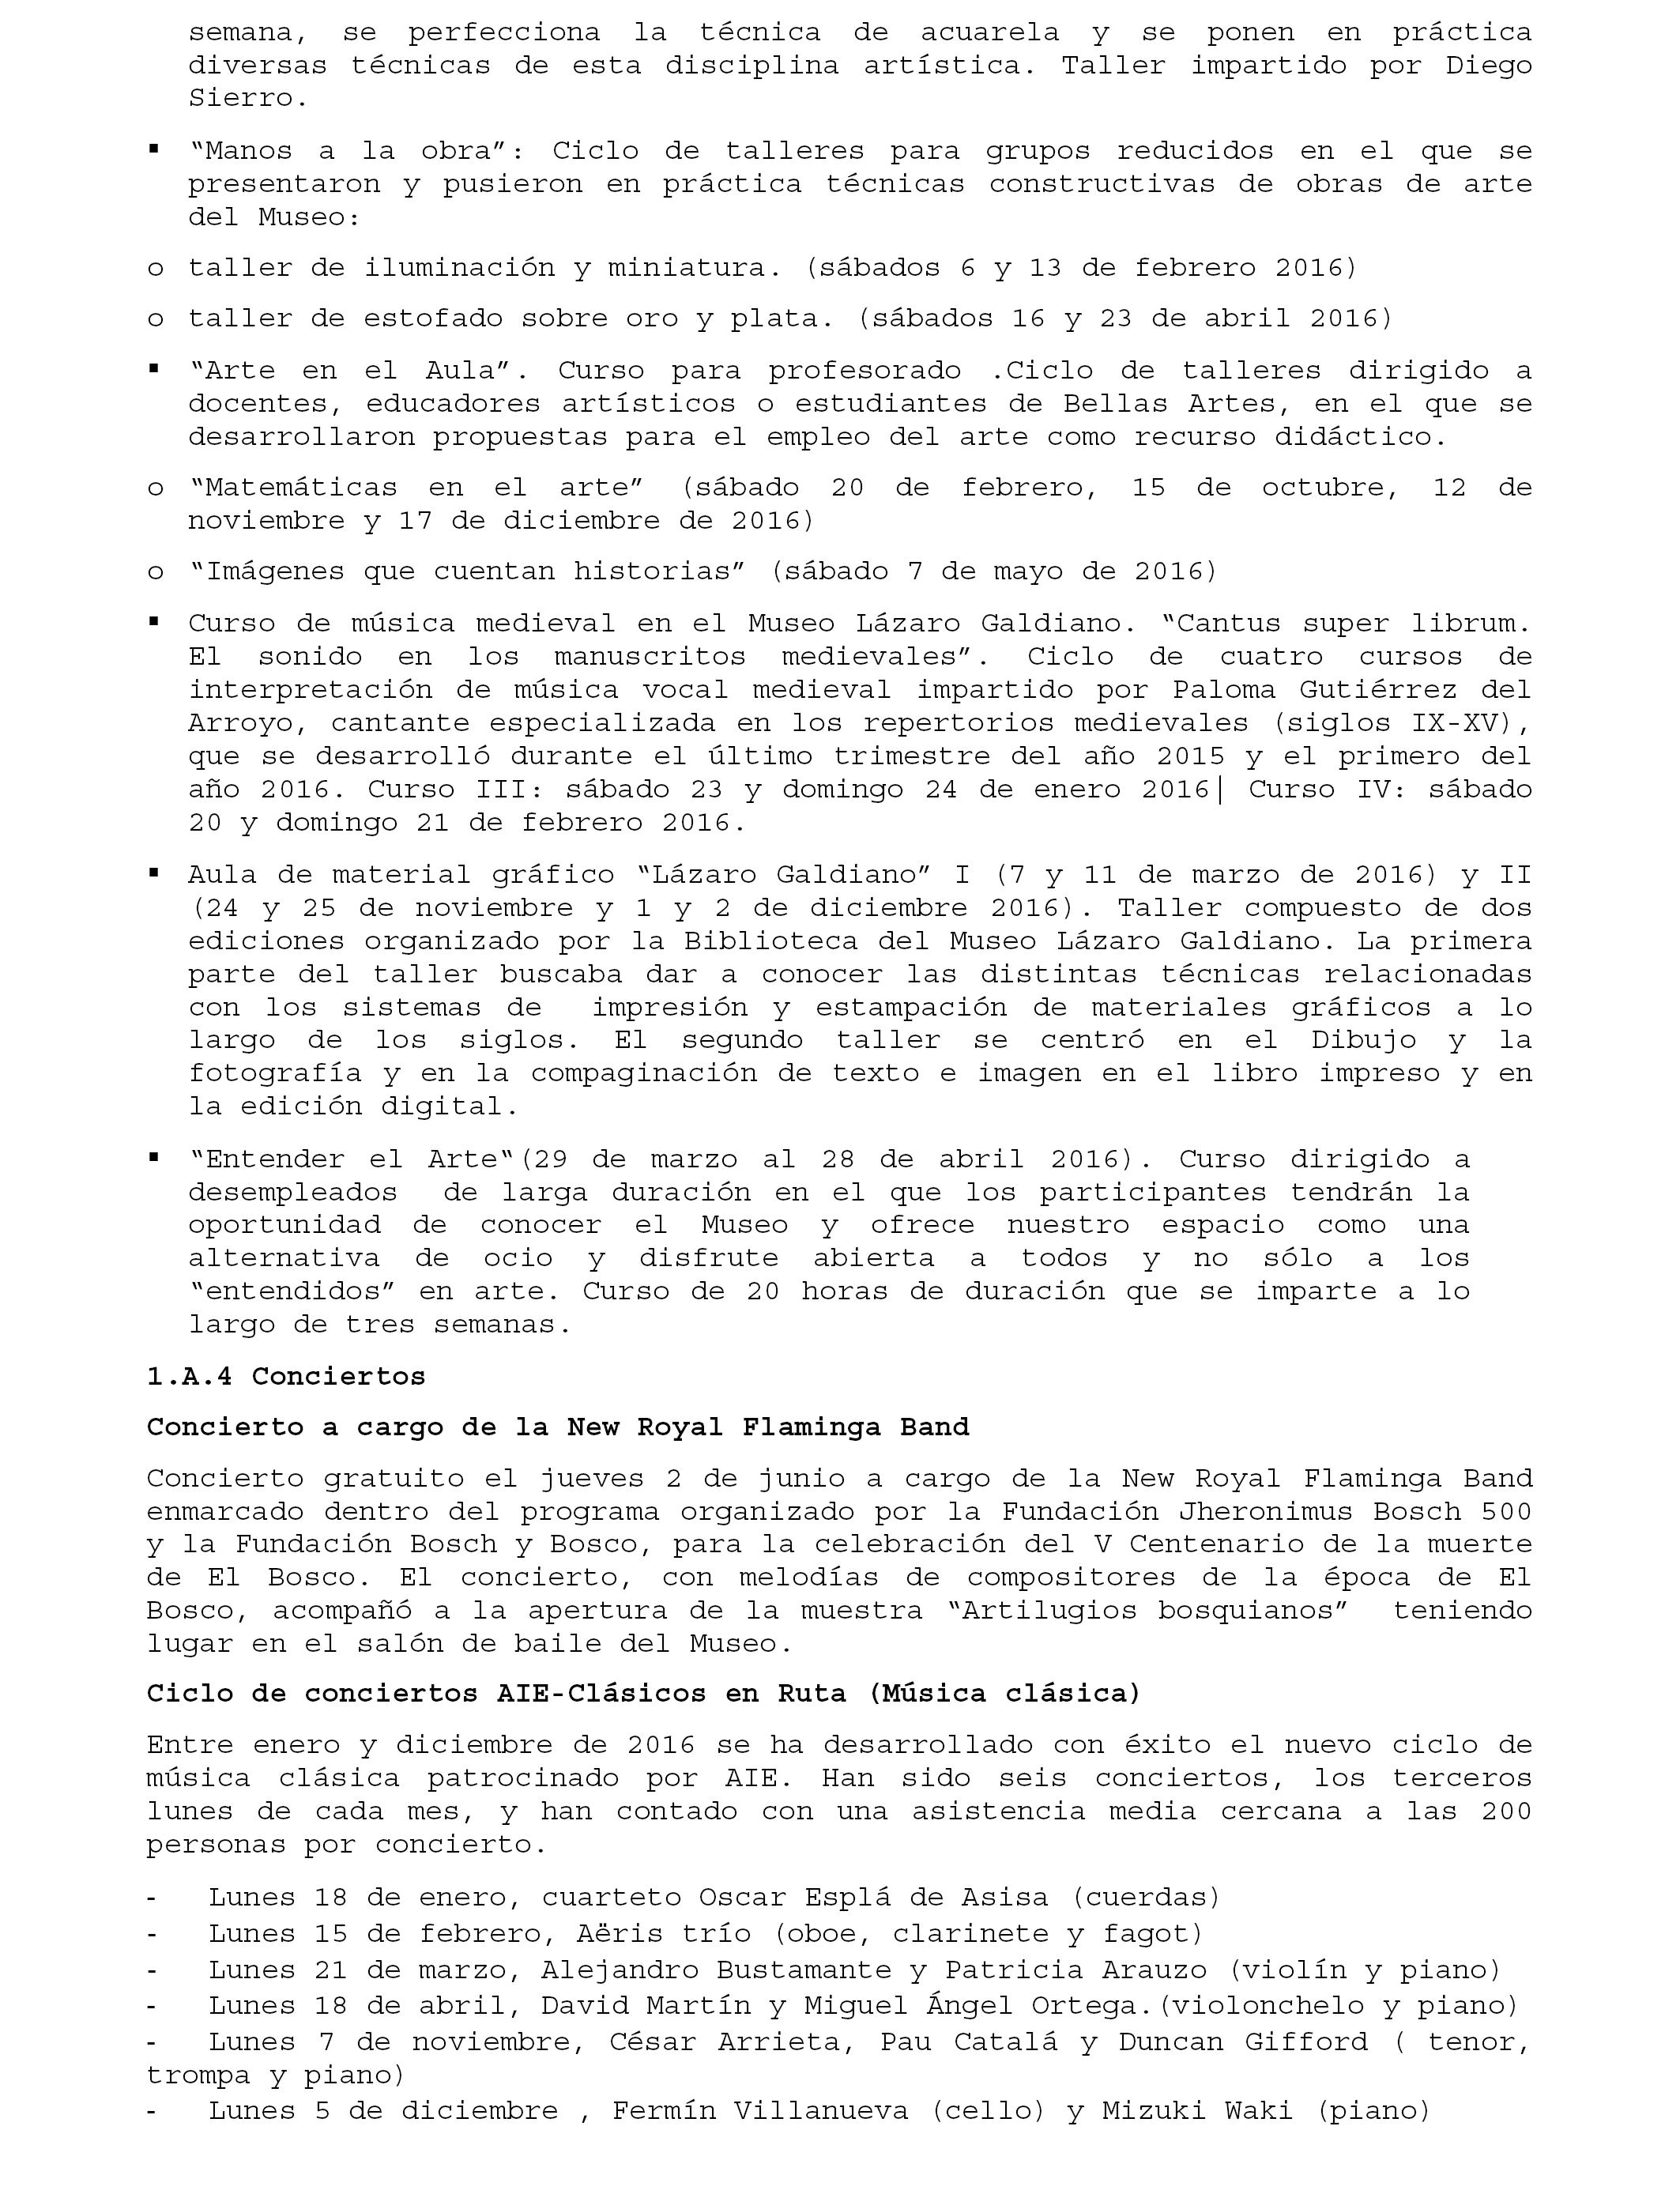 BOE.es - Documento BOE-A-2017-8857